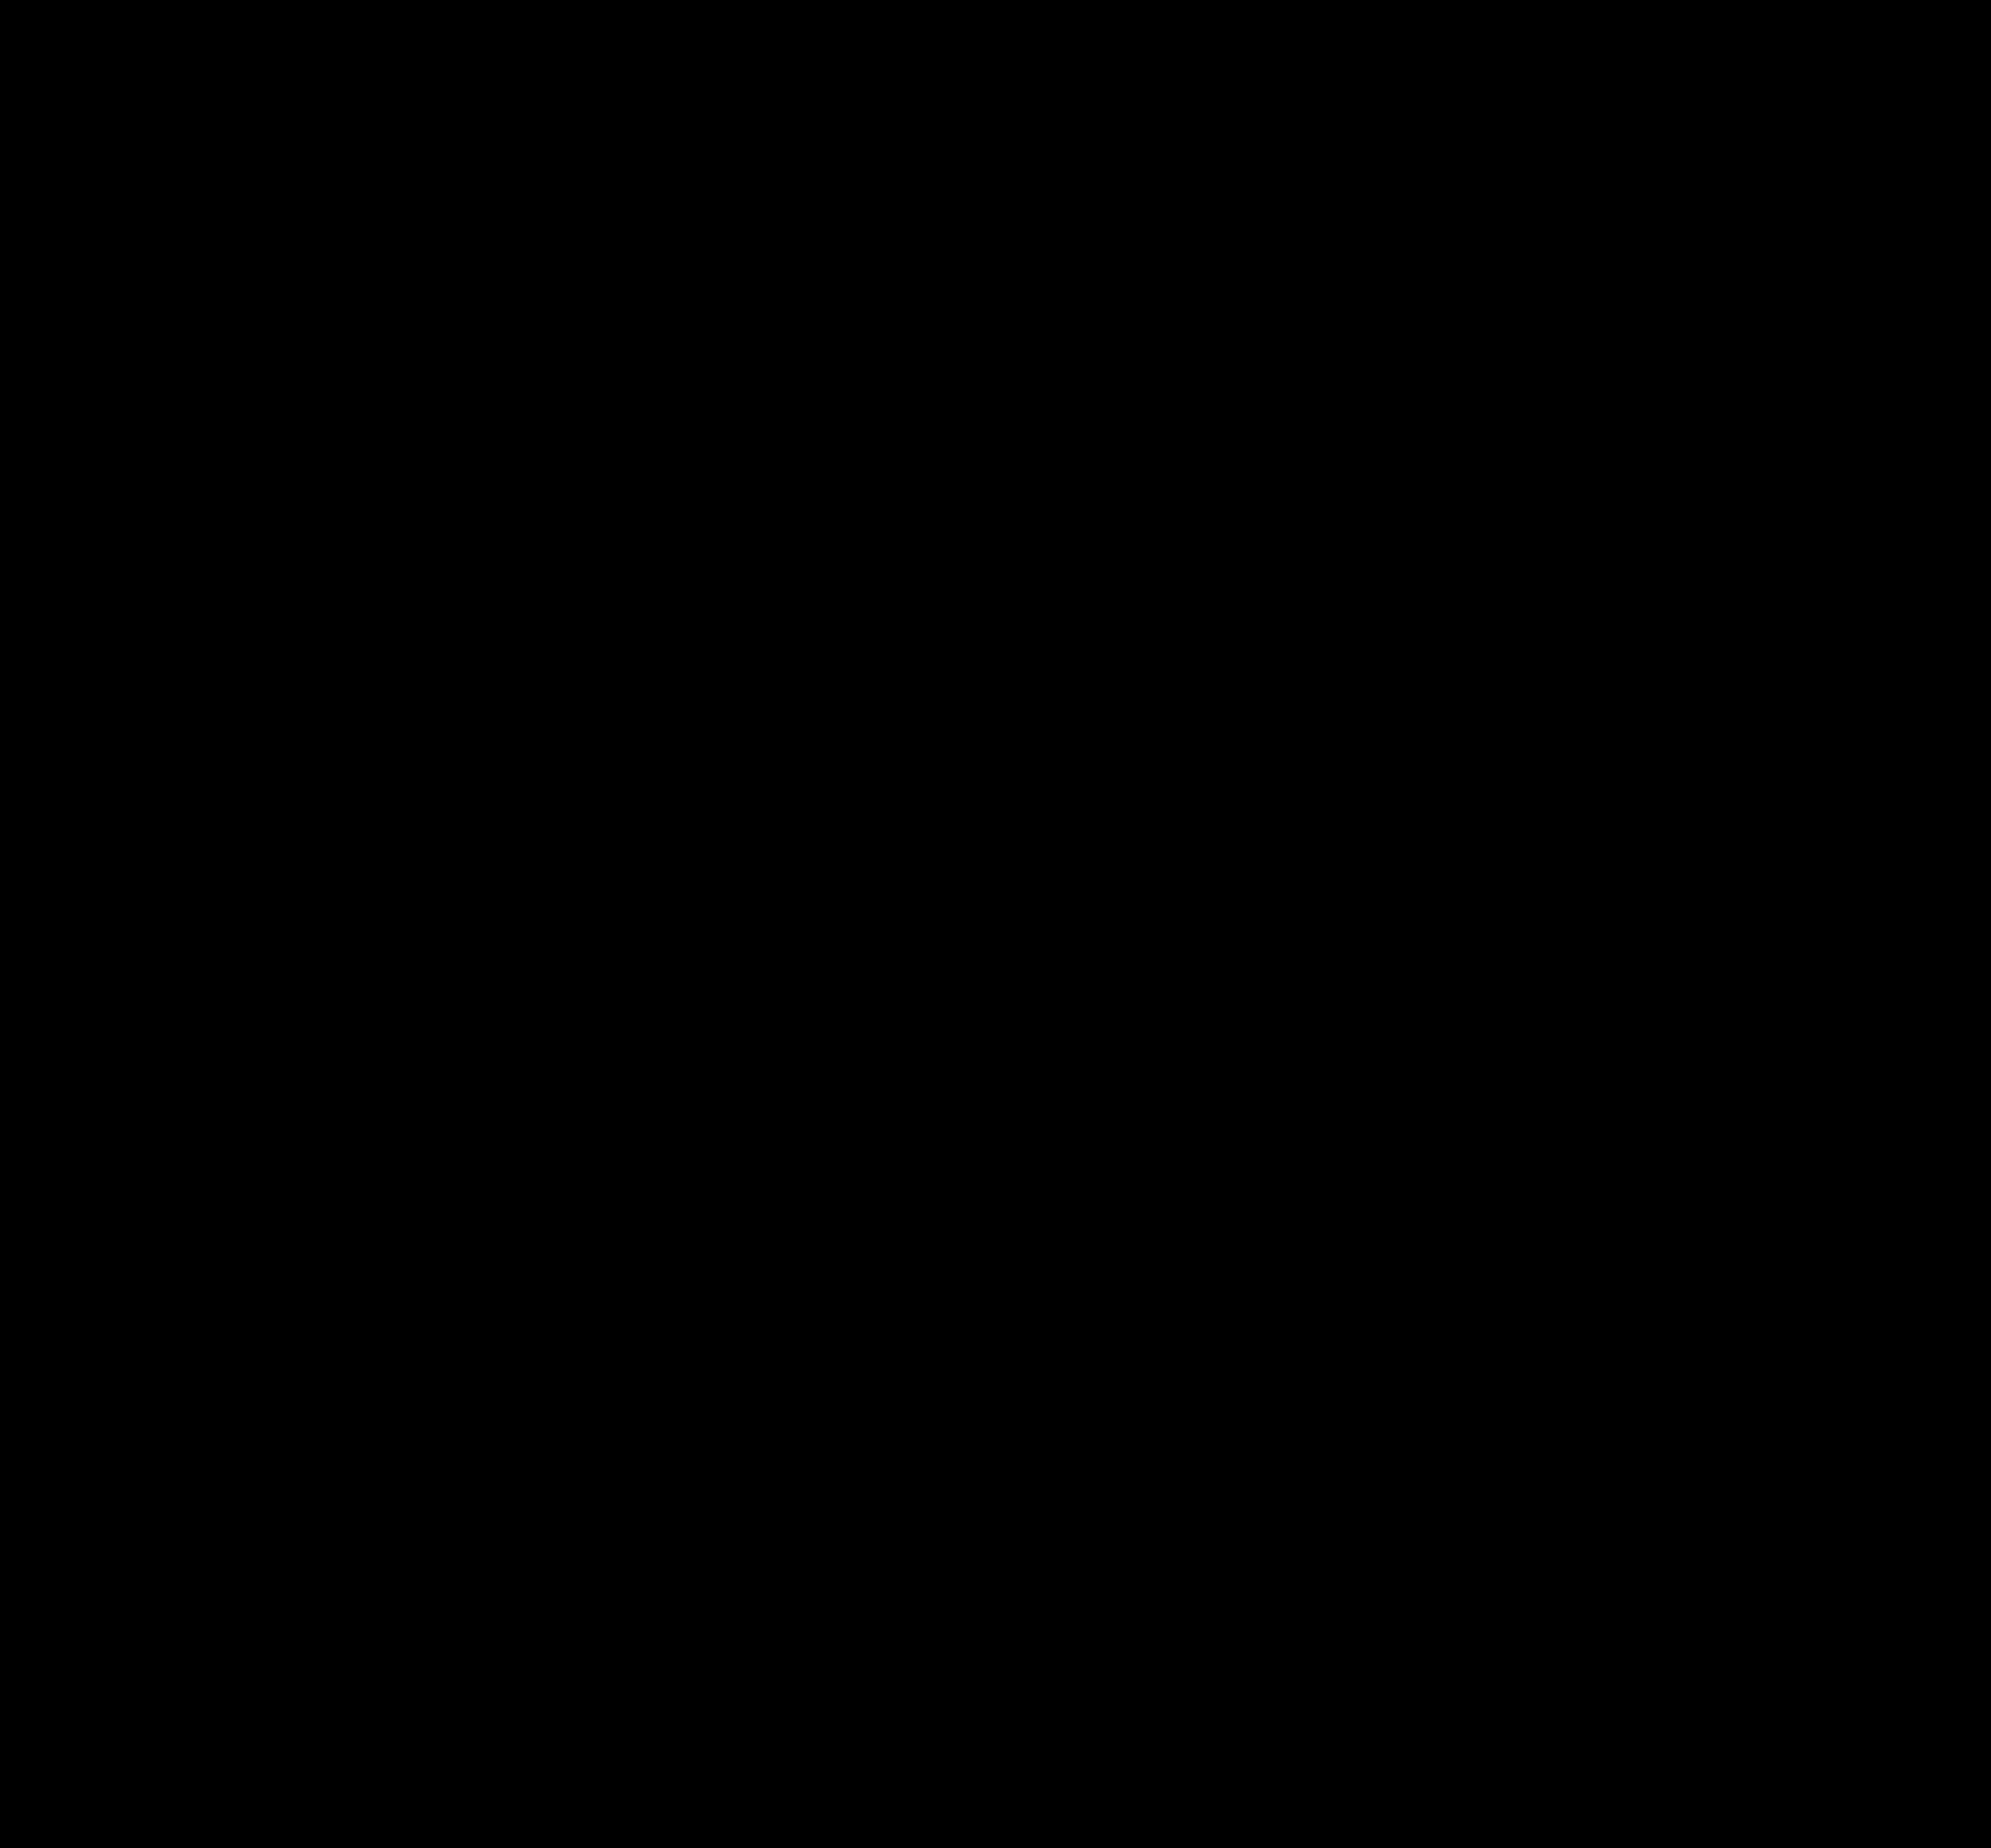 Christmas tree silhouette clip. Ornament clipart line art